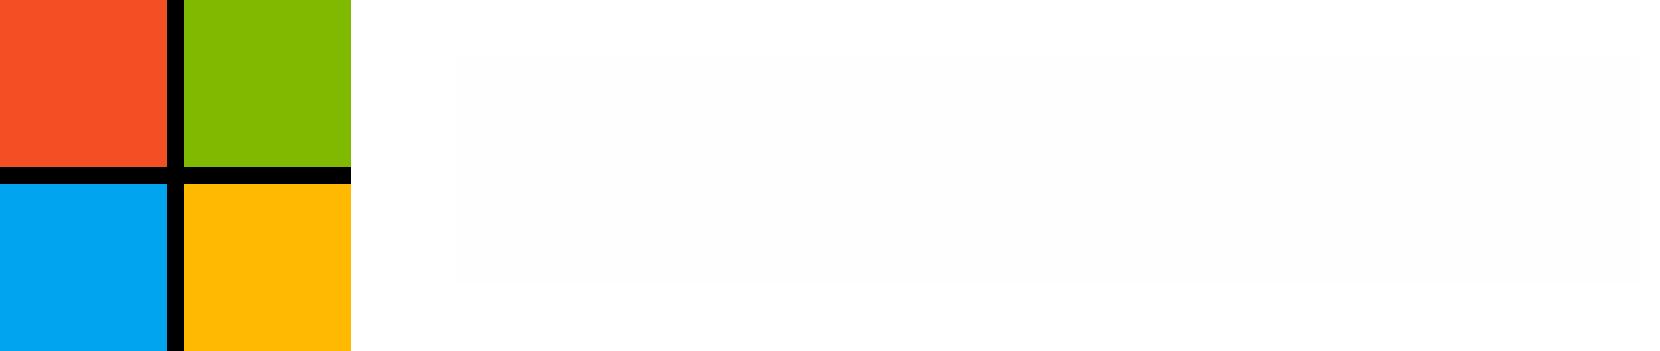 Microsoft logo white text transparent 1